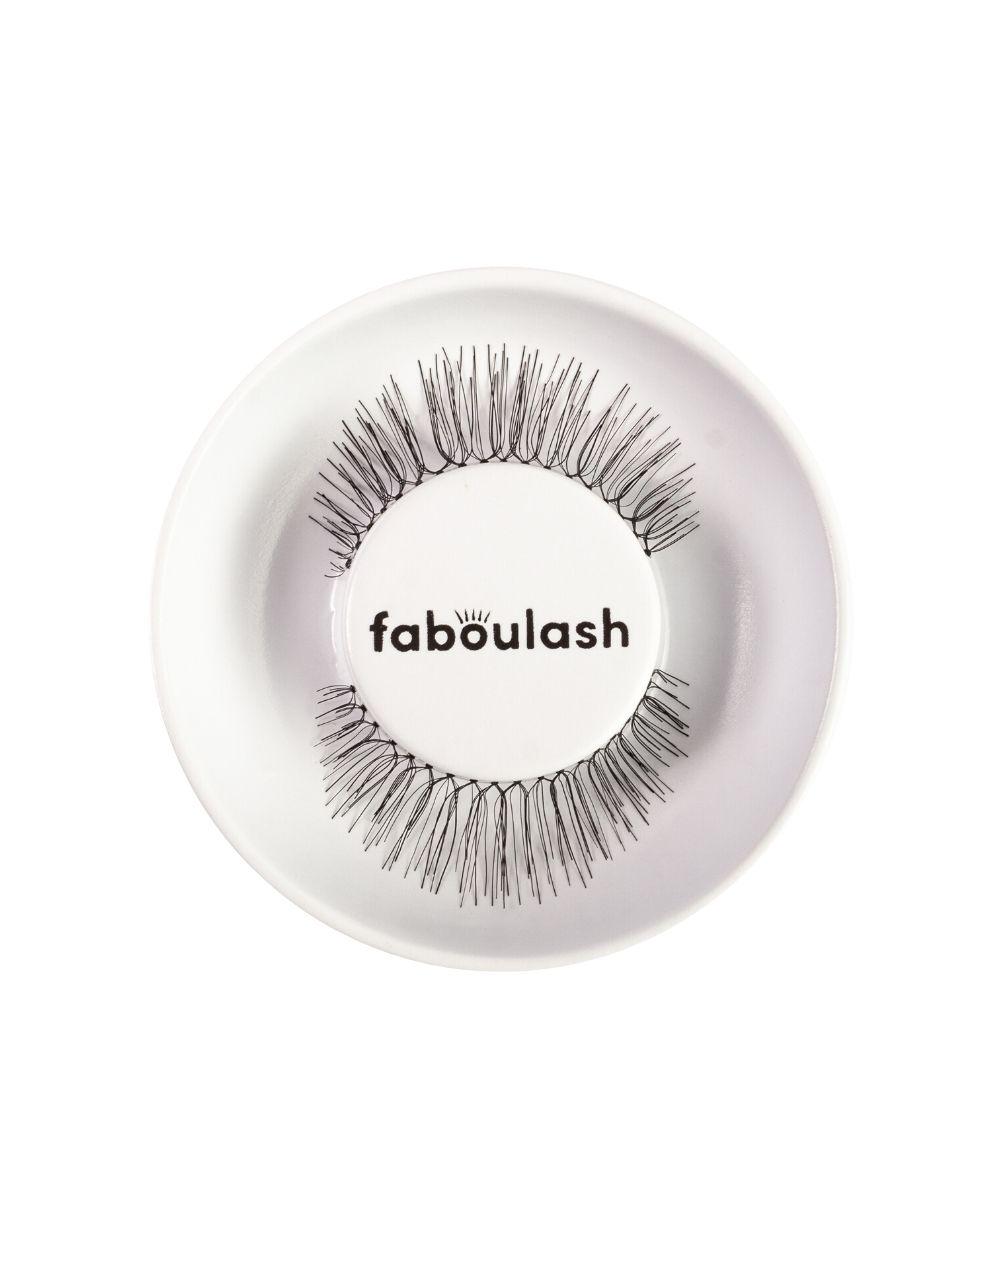 Faboulash 412 by Faboulash